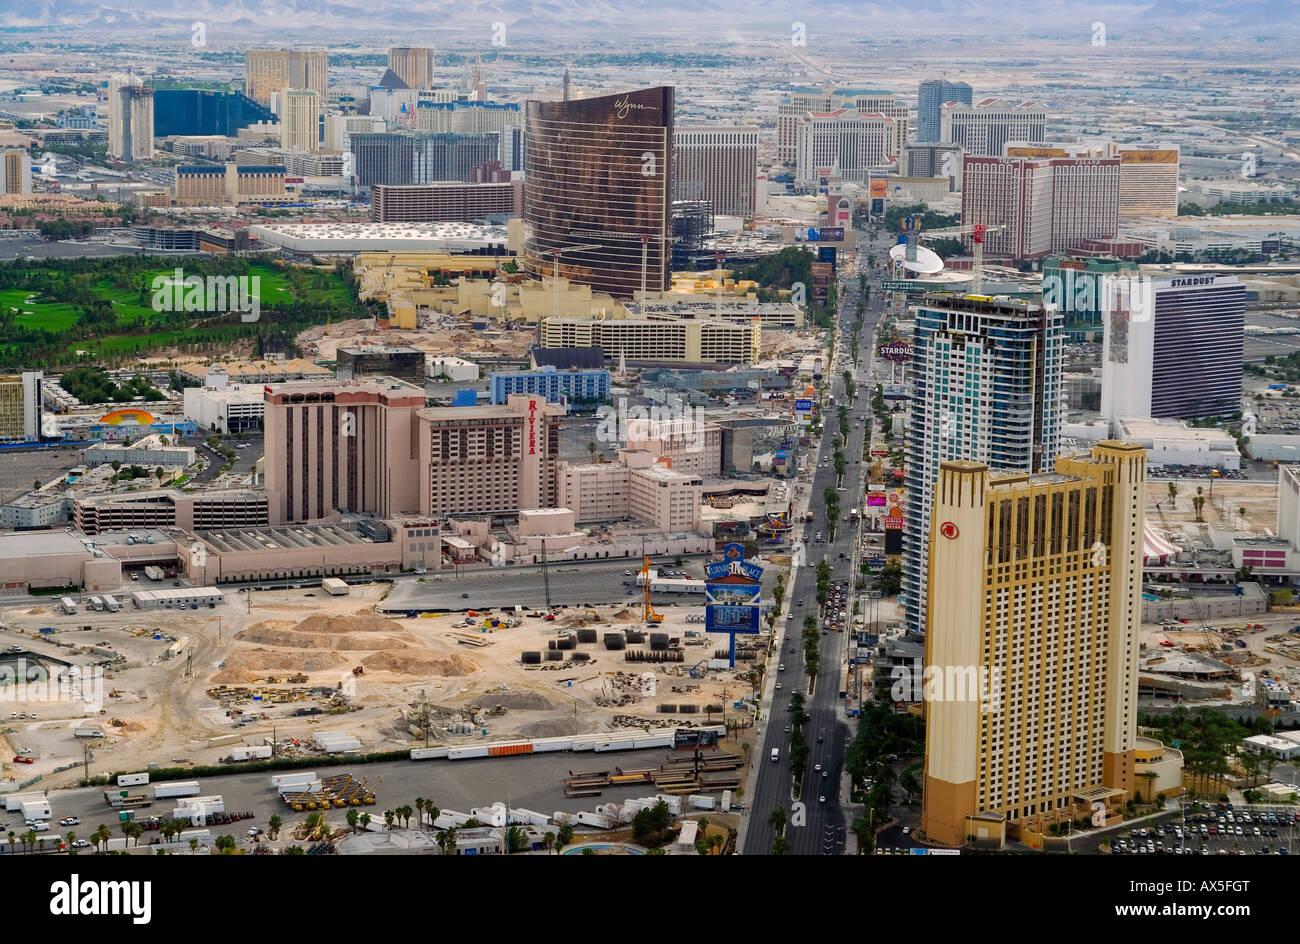 Construction sites along the strip viewed from Stratosphere Tower, Las Vegas Boulevard, Las Vegas, Nevada, USA, - Stock Image